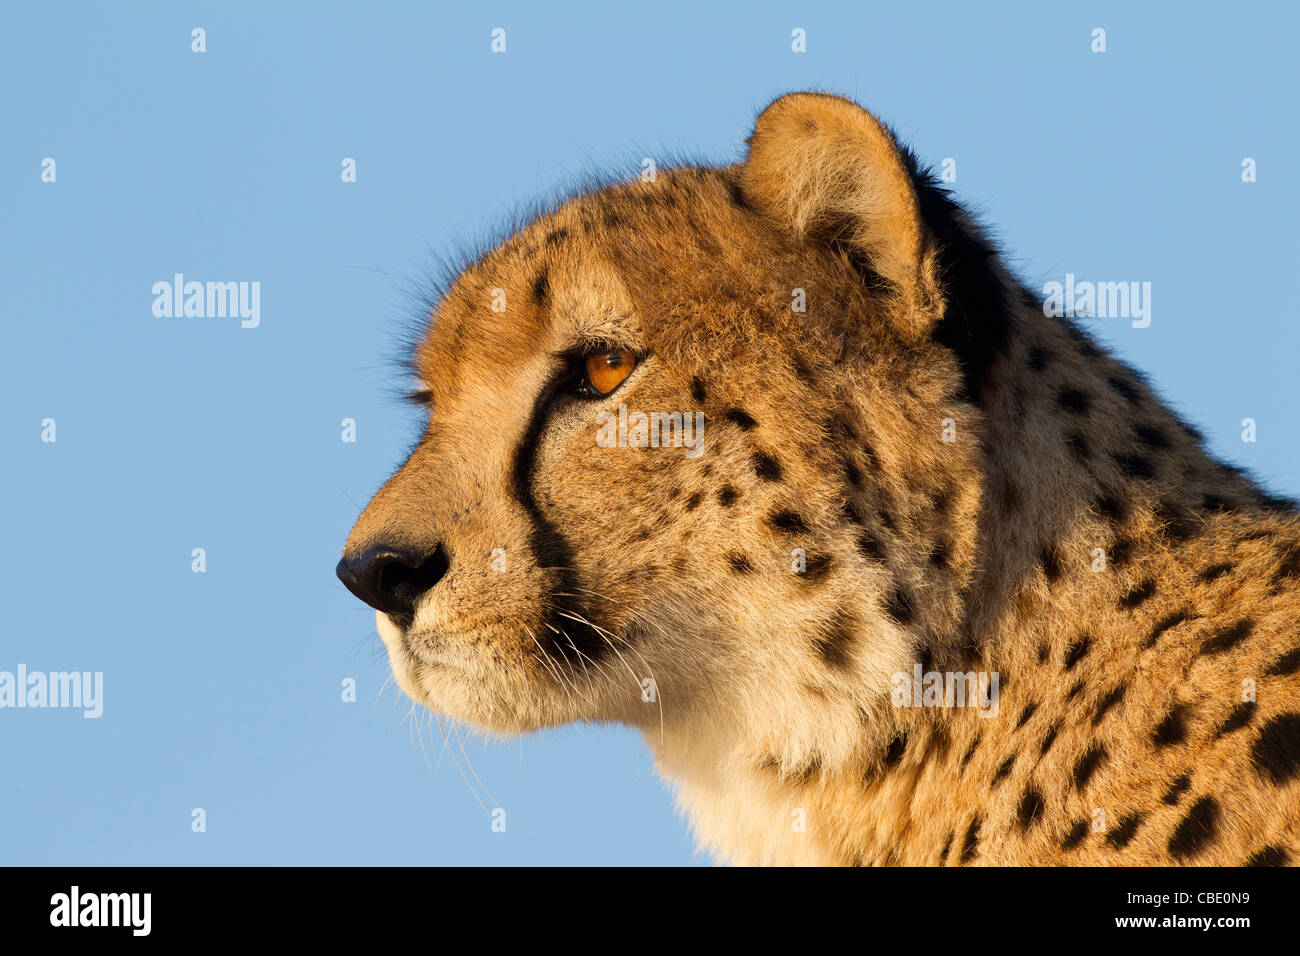 Cheetah (Acinonyx jubatus) on a lower angle with beautiful  light in eye. - Stock Image